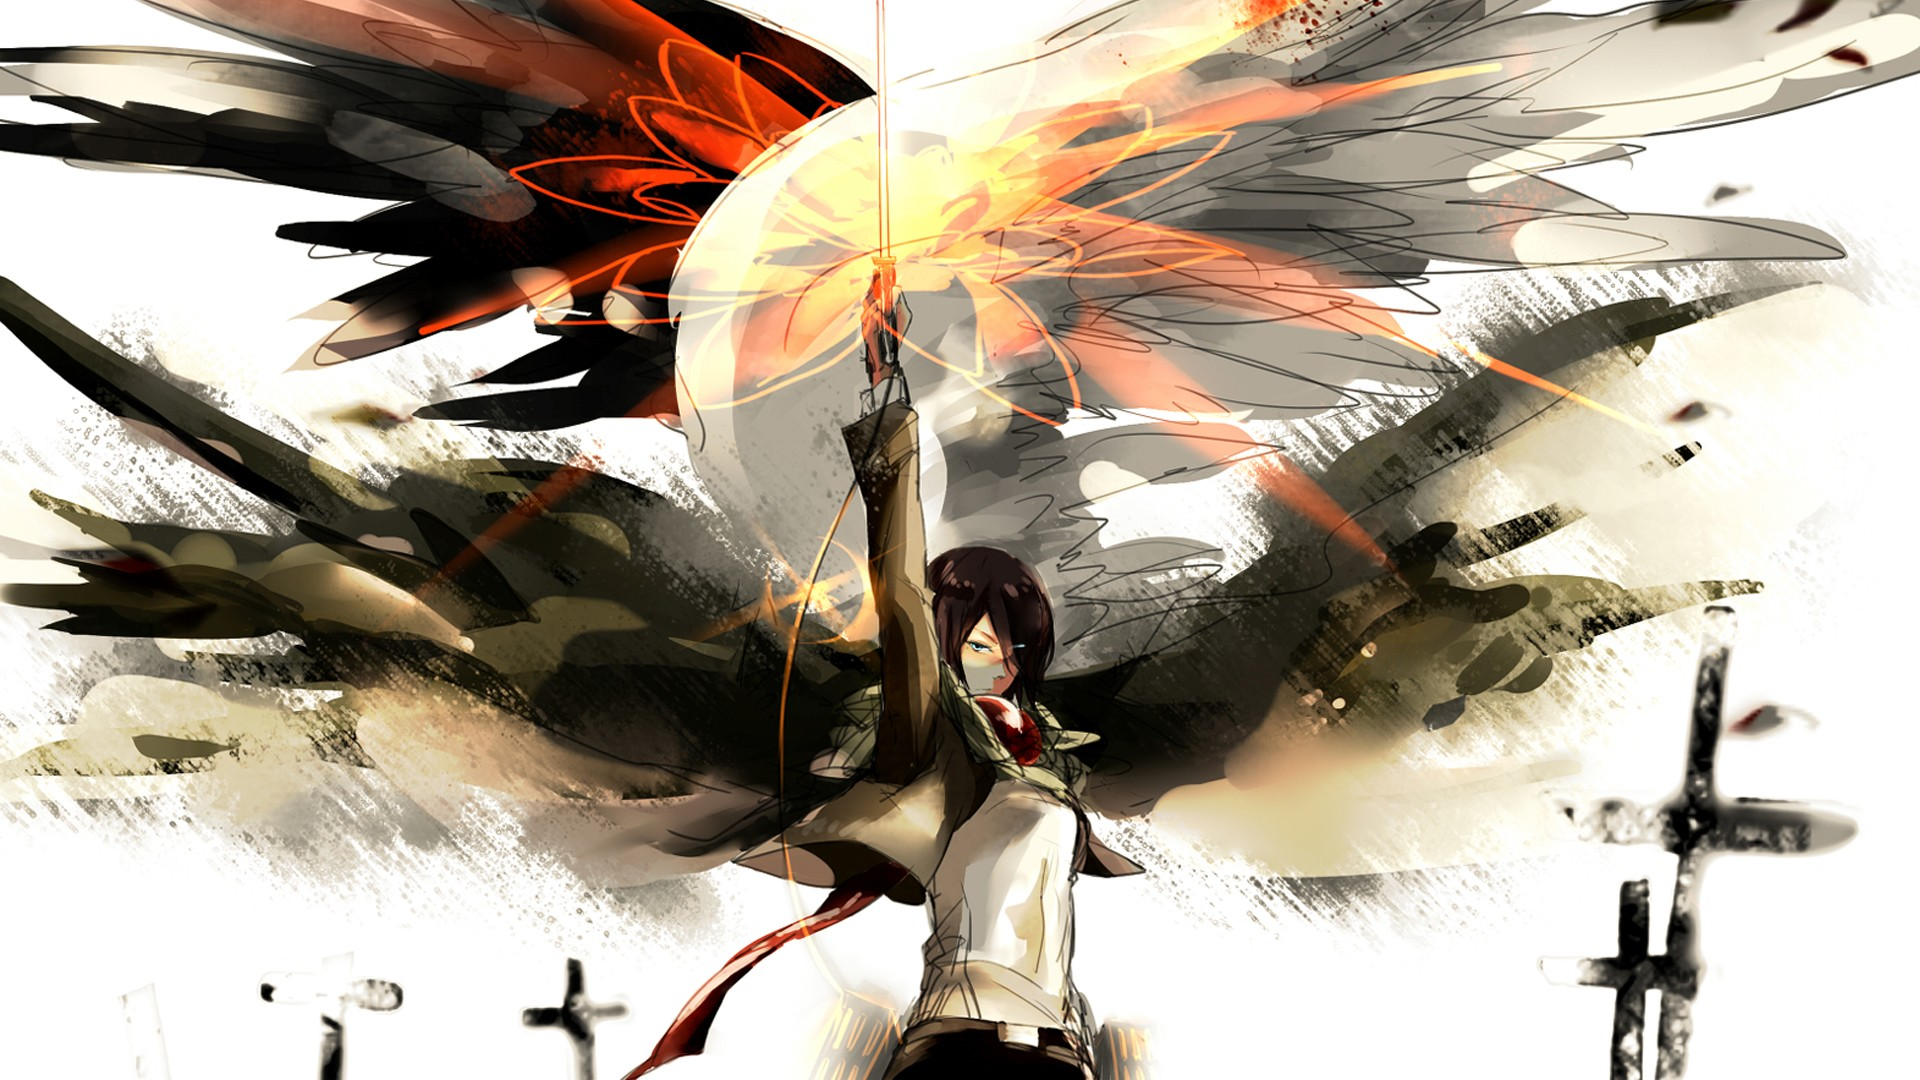 49 Attack On Titan Mikasa Wallpaper On Wallpapersafari